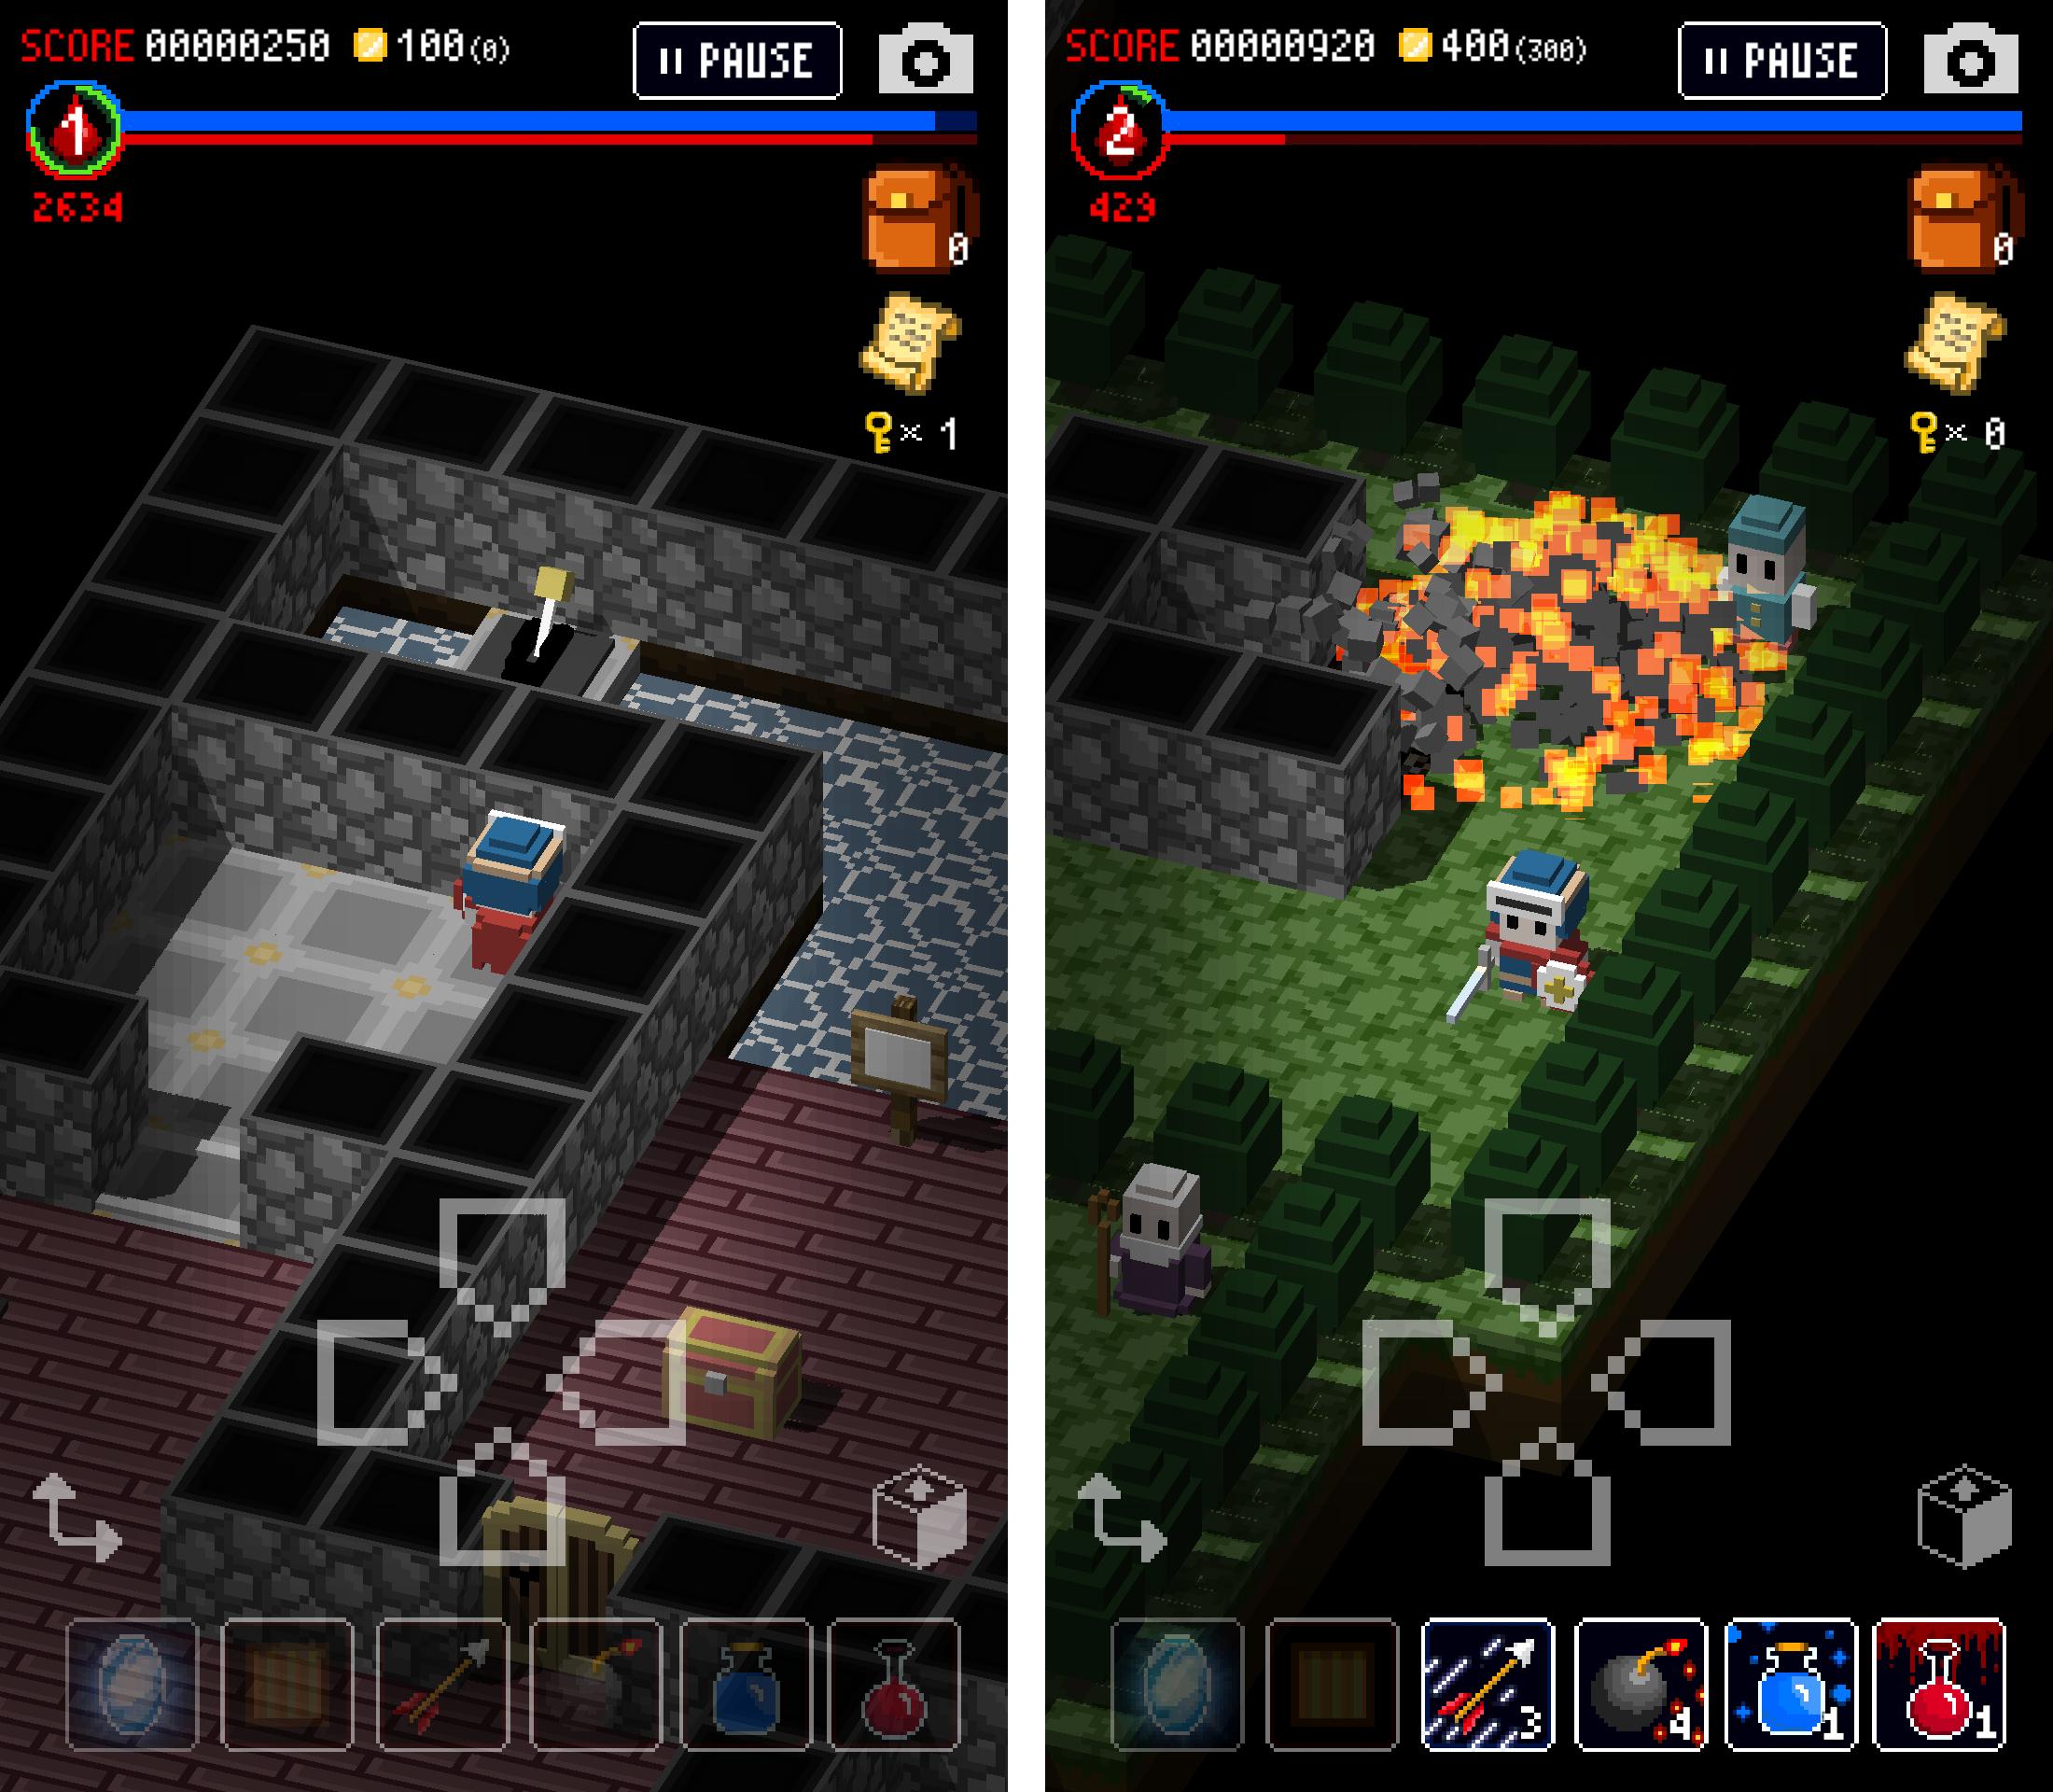 androidアプリ ダンジョンに立つ墓標(Dungeon of Gravestone)攻略スクリーンショット5